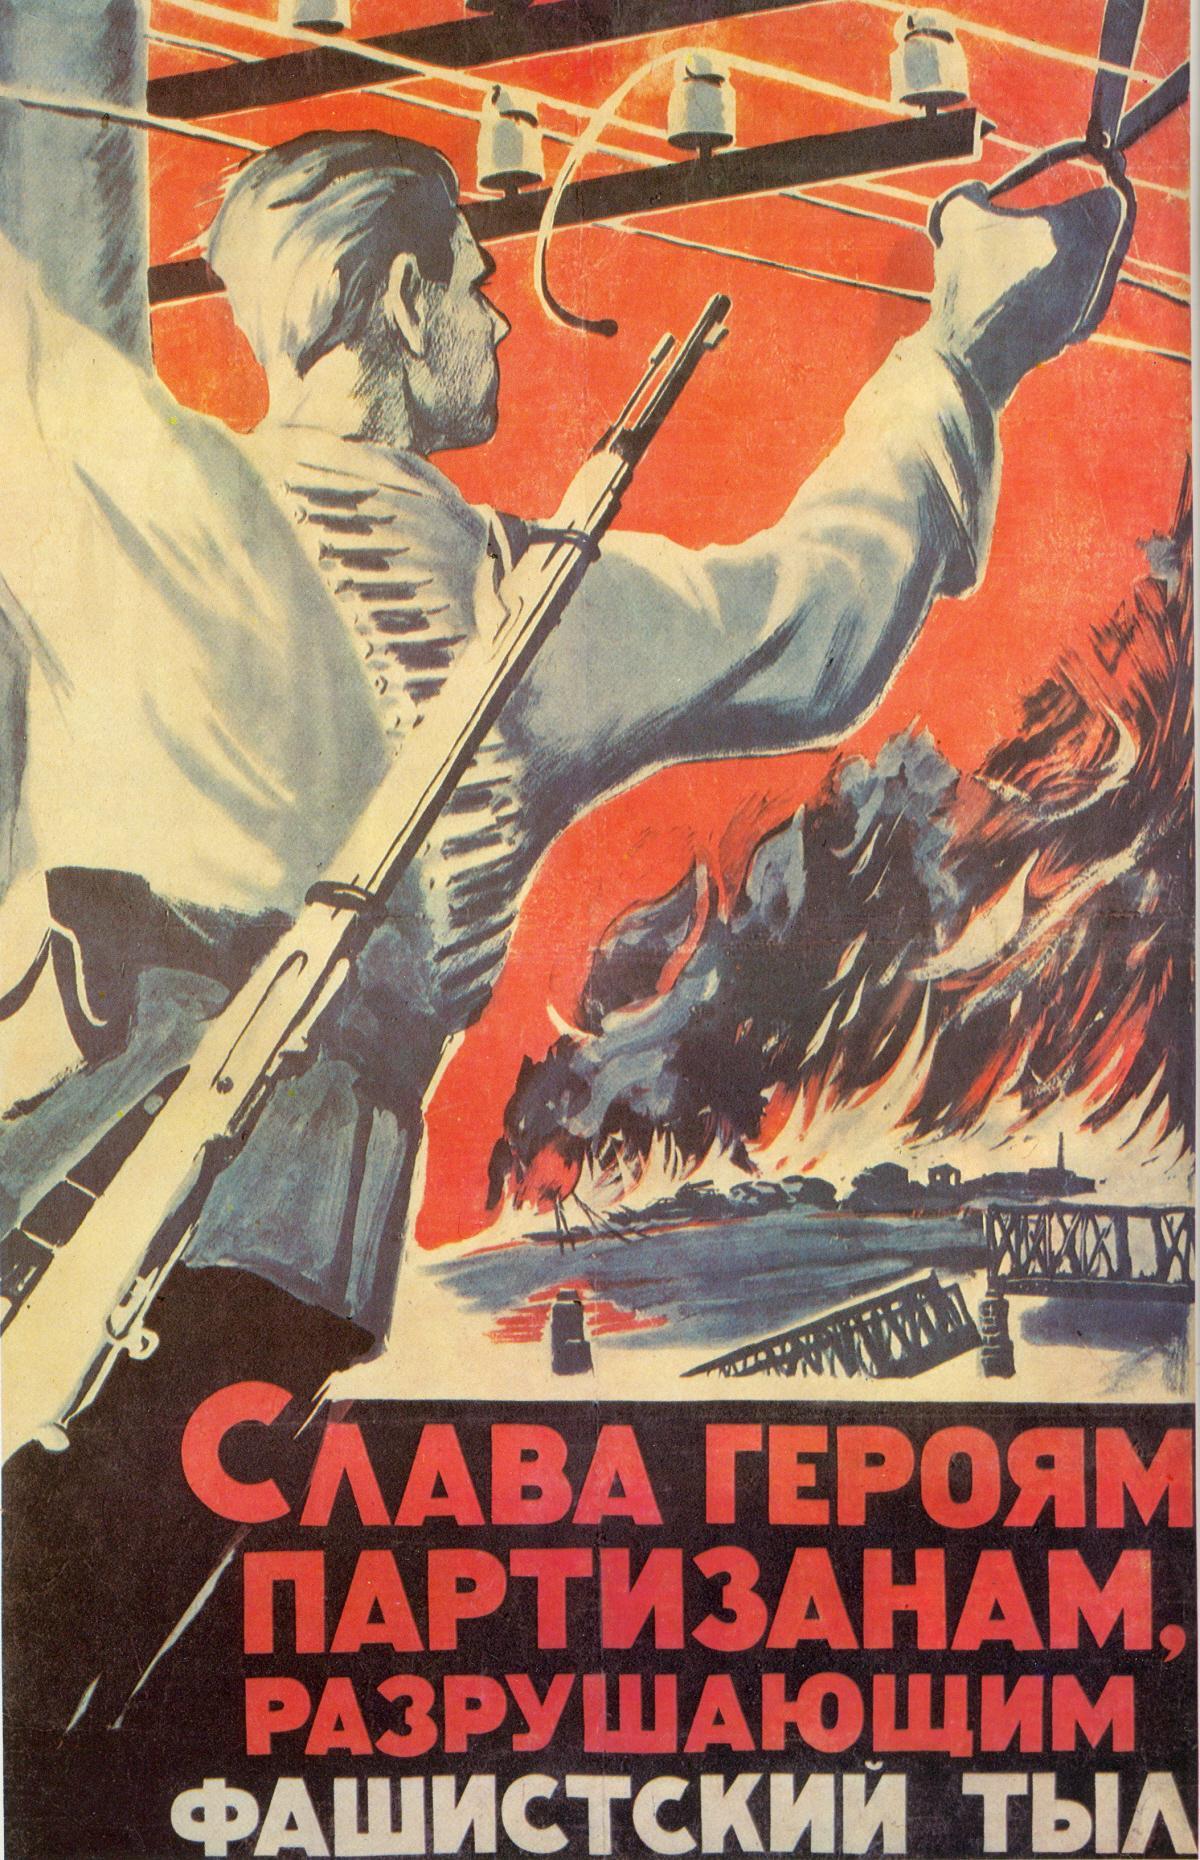 01 P P Gorely. Glory to the Hero Partisans, Weakening the Fascist Rear! 1941